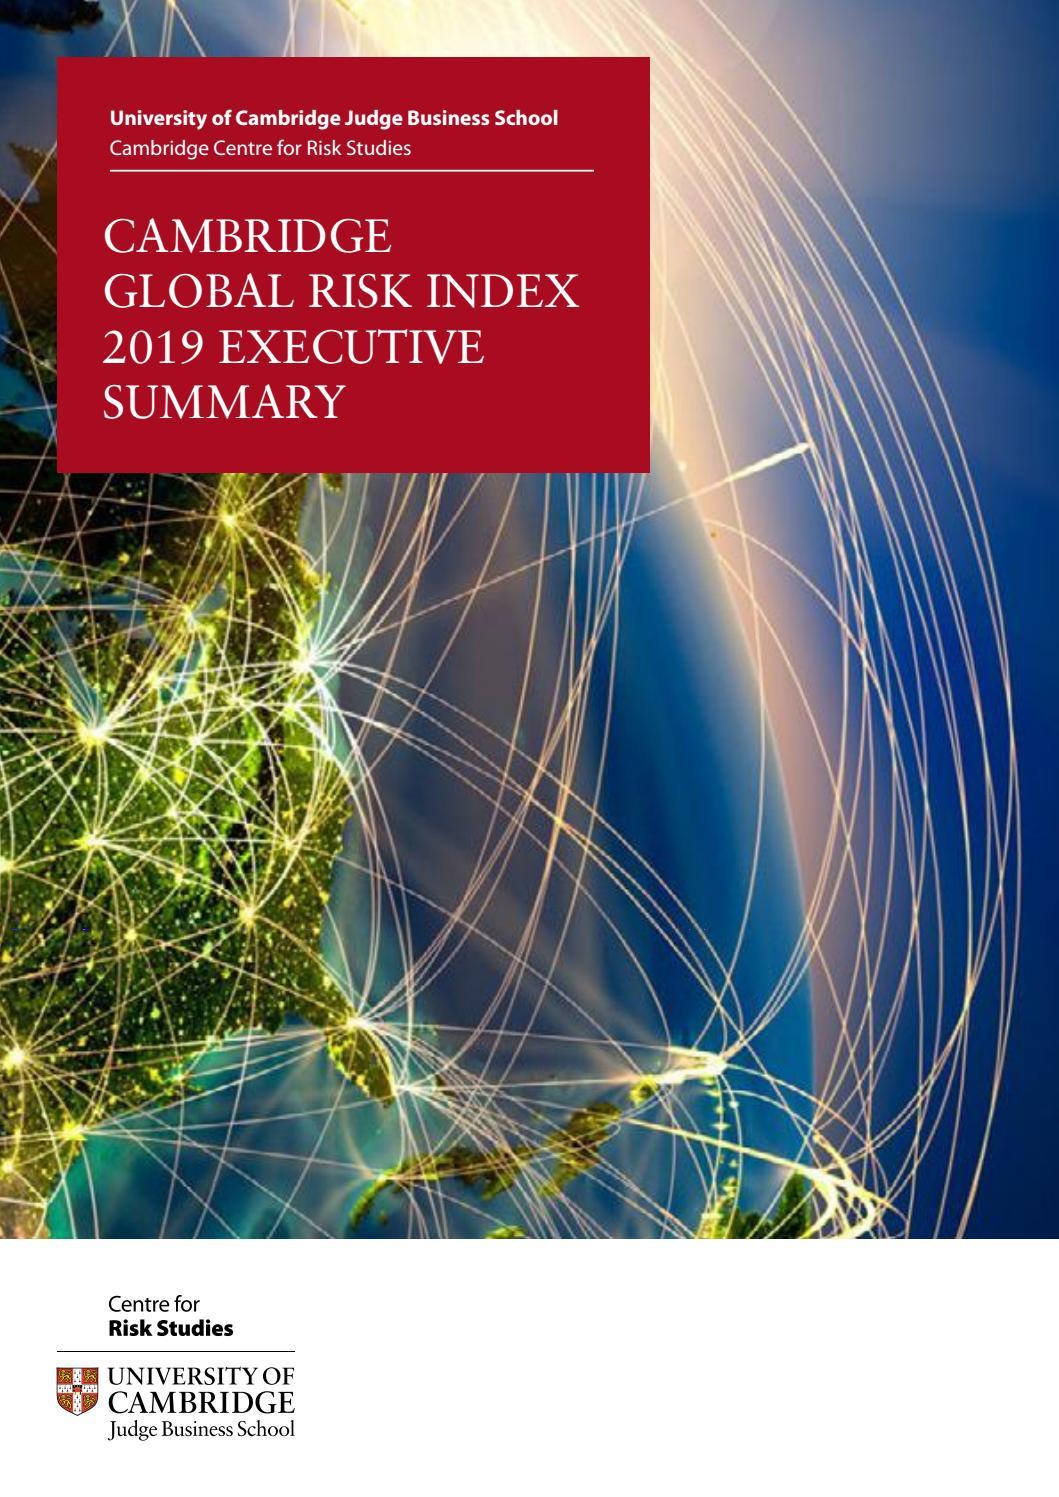 Cambridge global risk index 2019: Executive summary by Cambridge